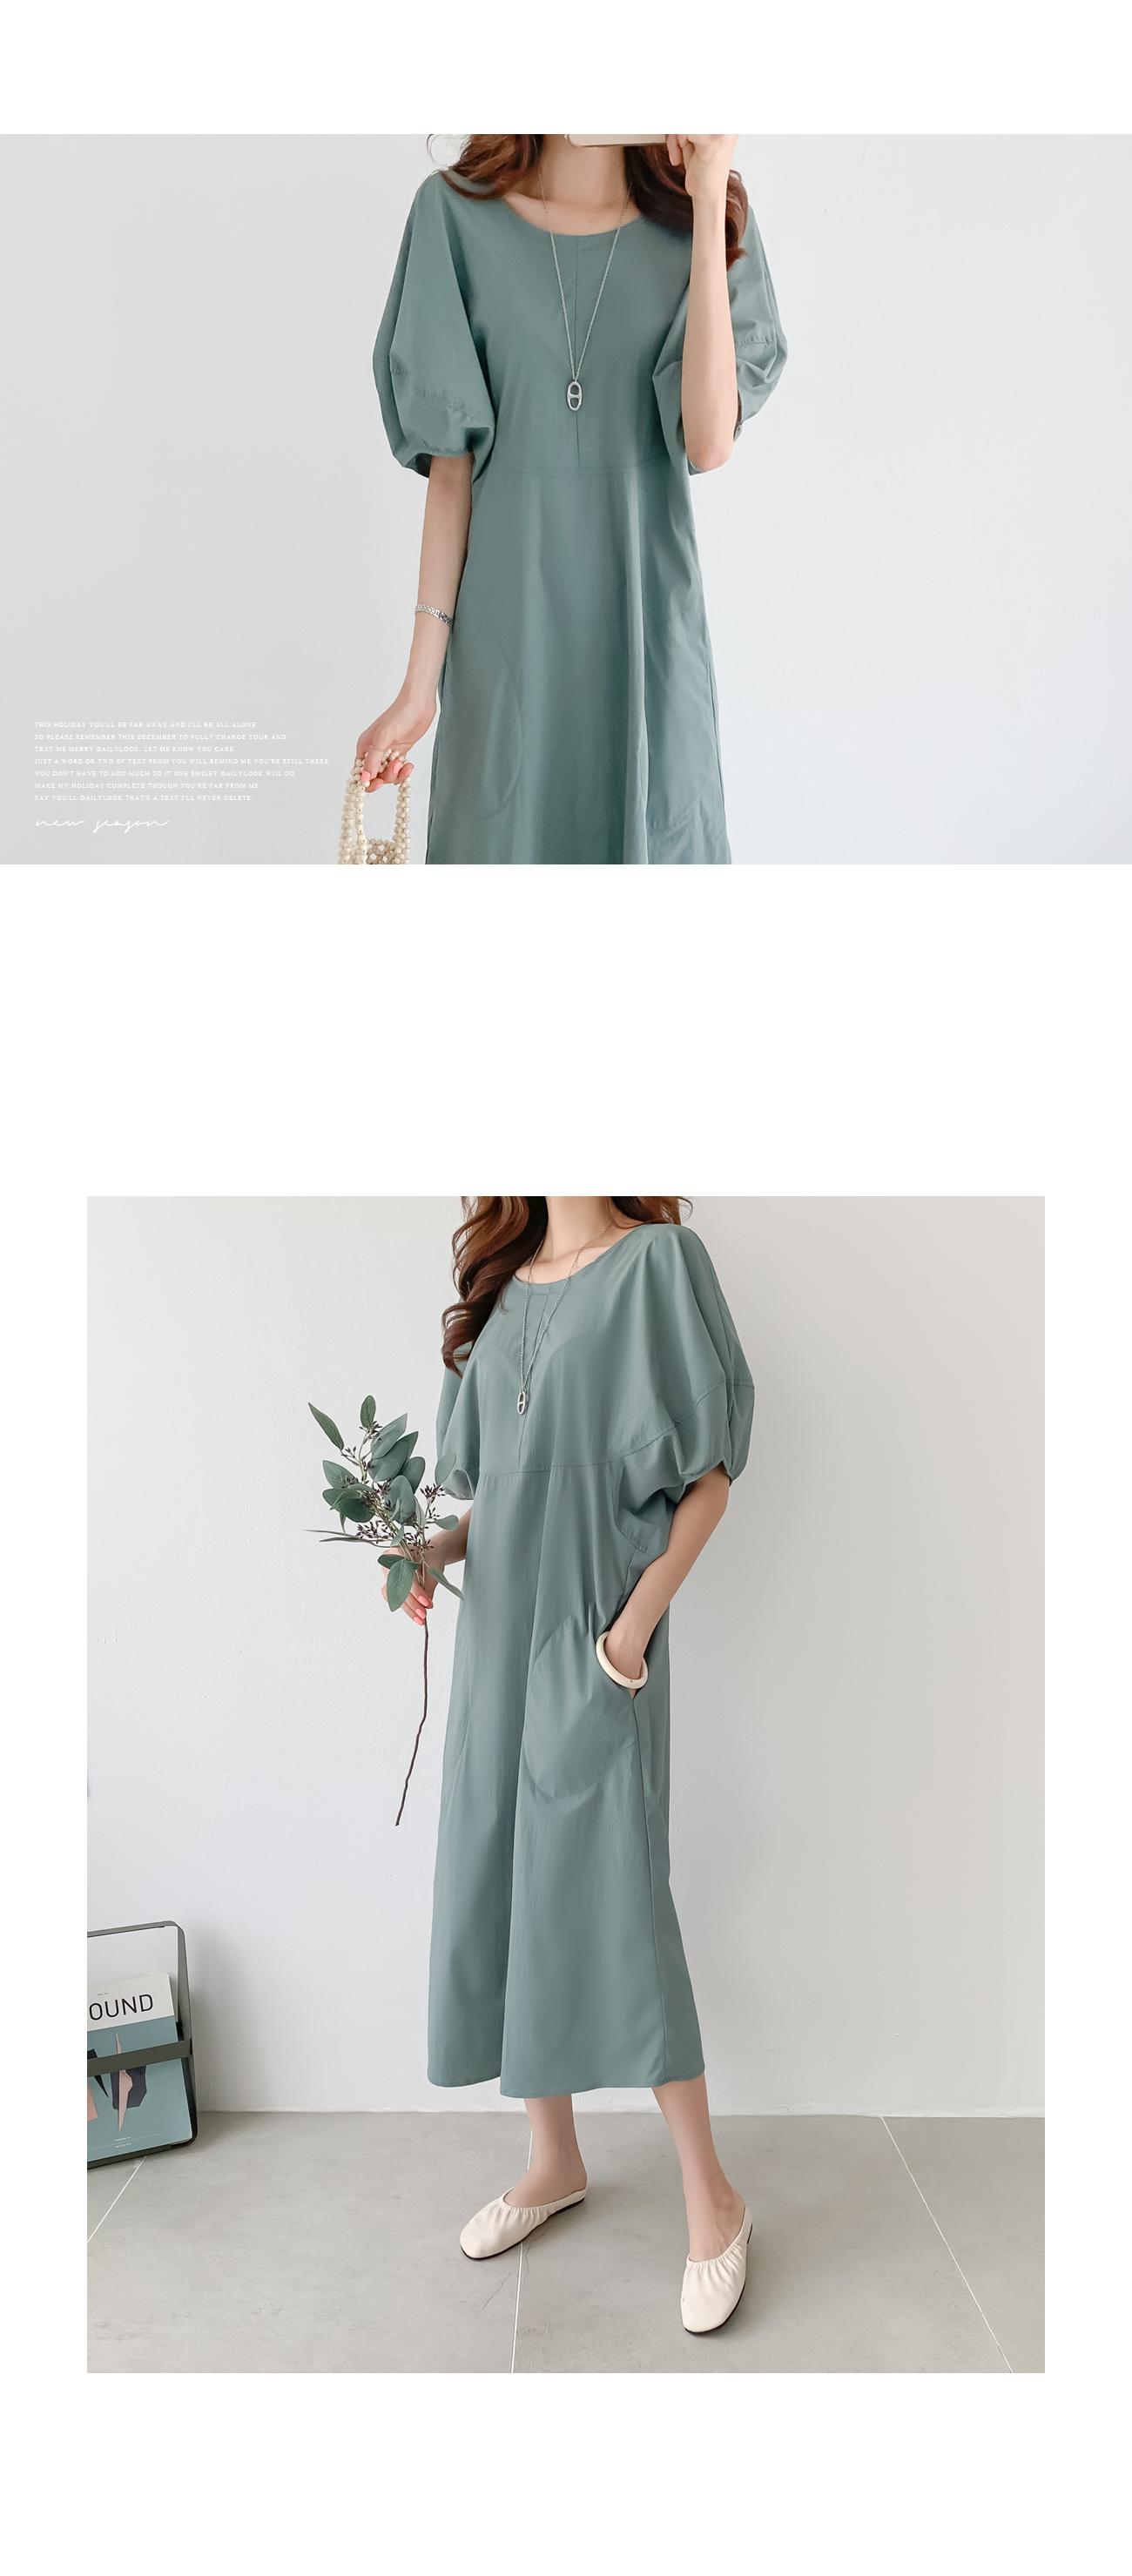 Puff sleeve pocket long dress #37214